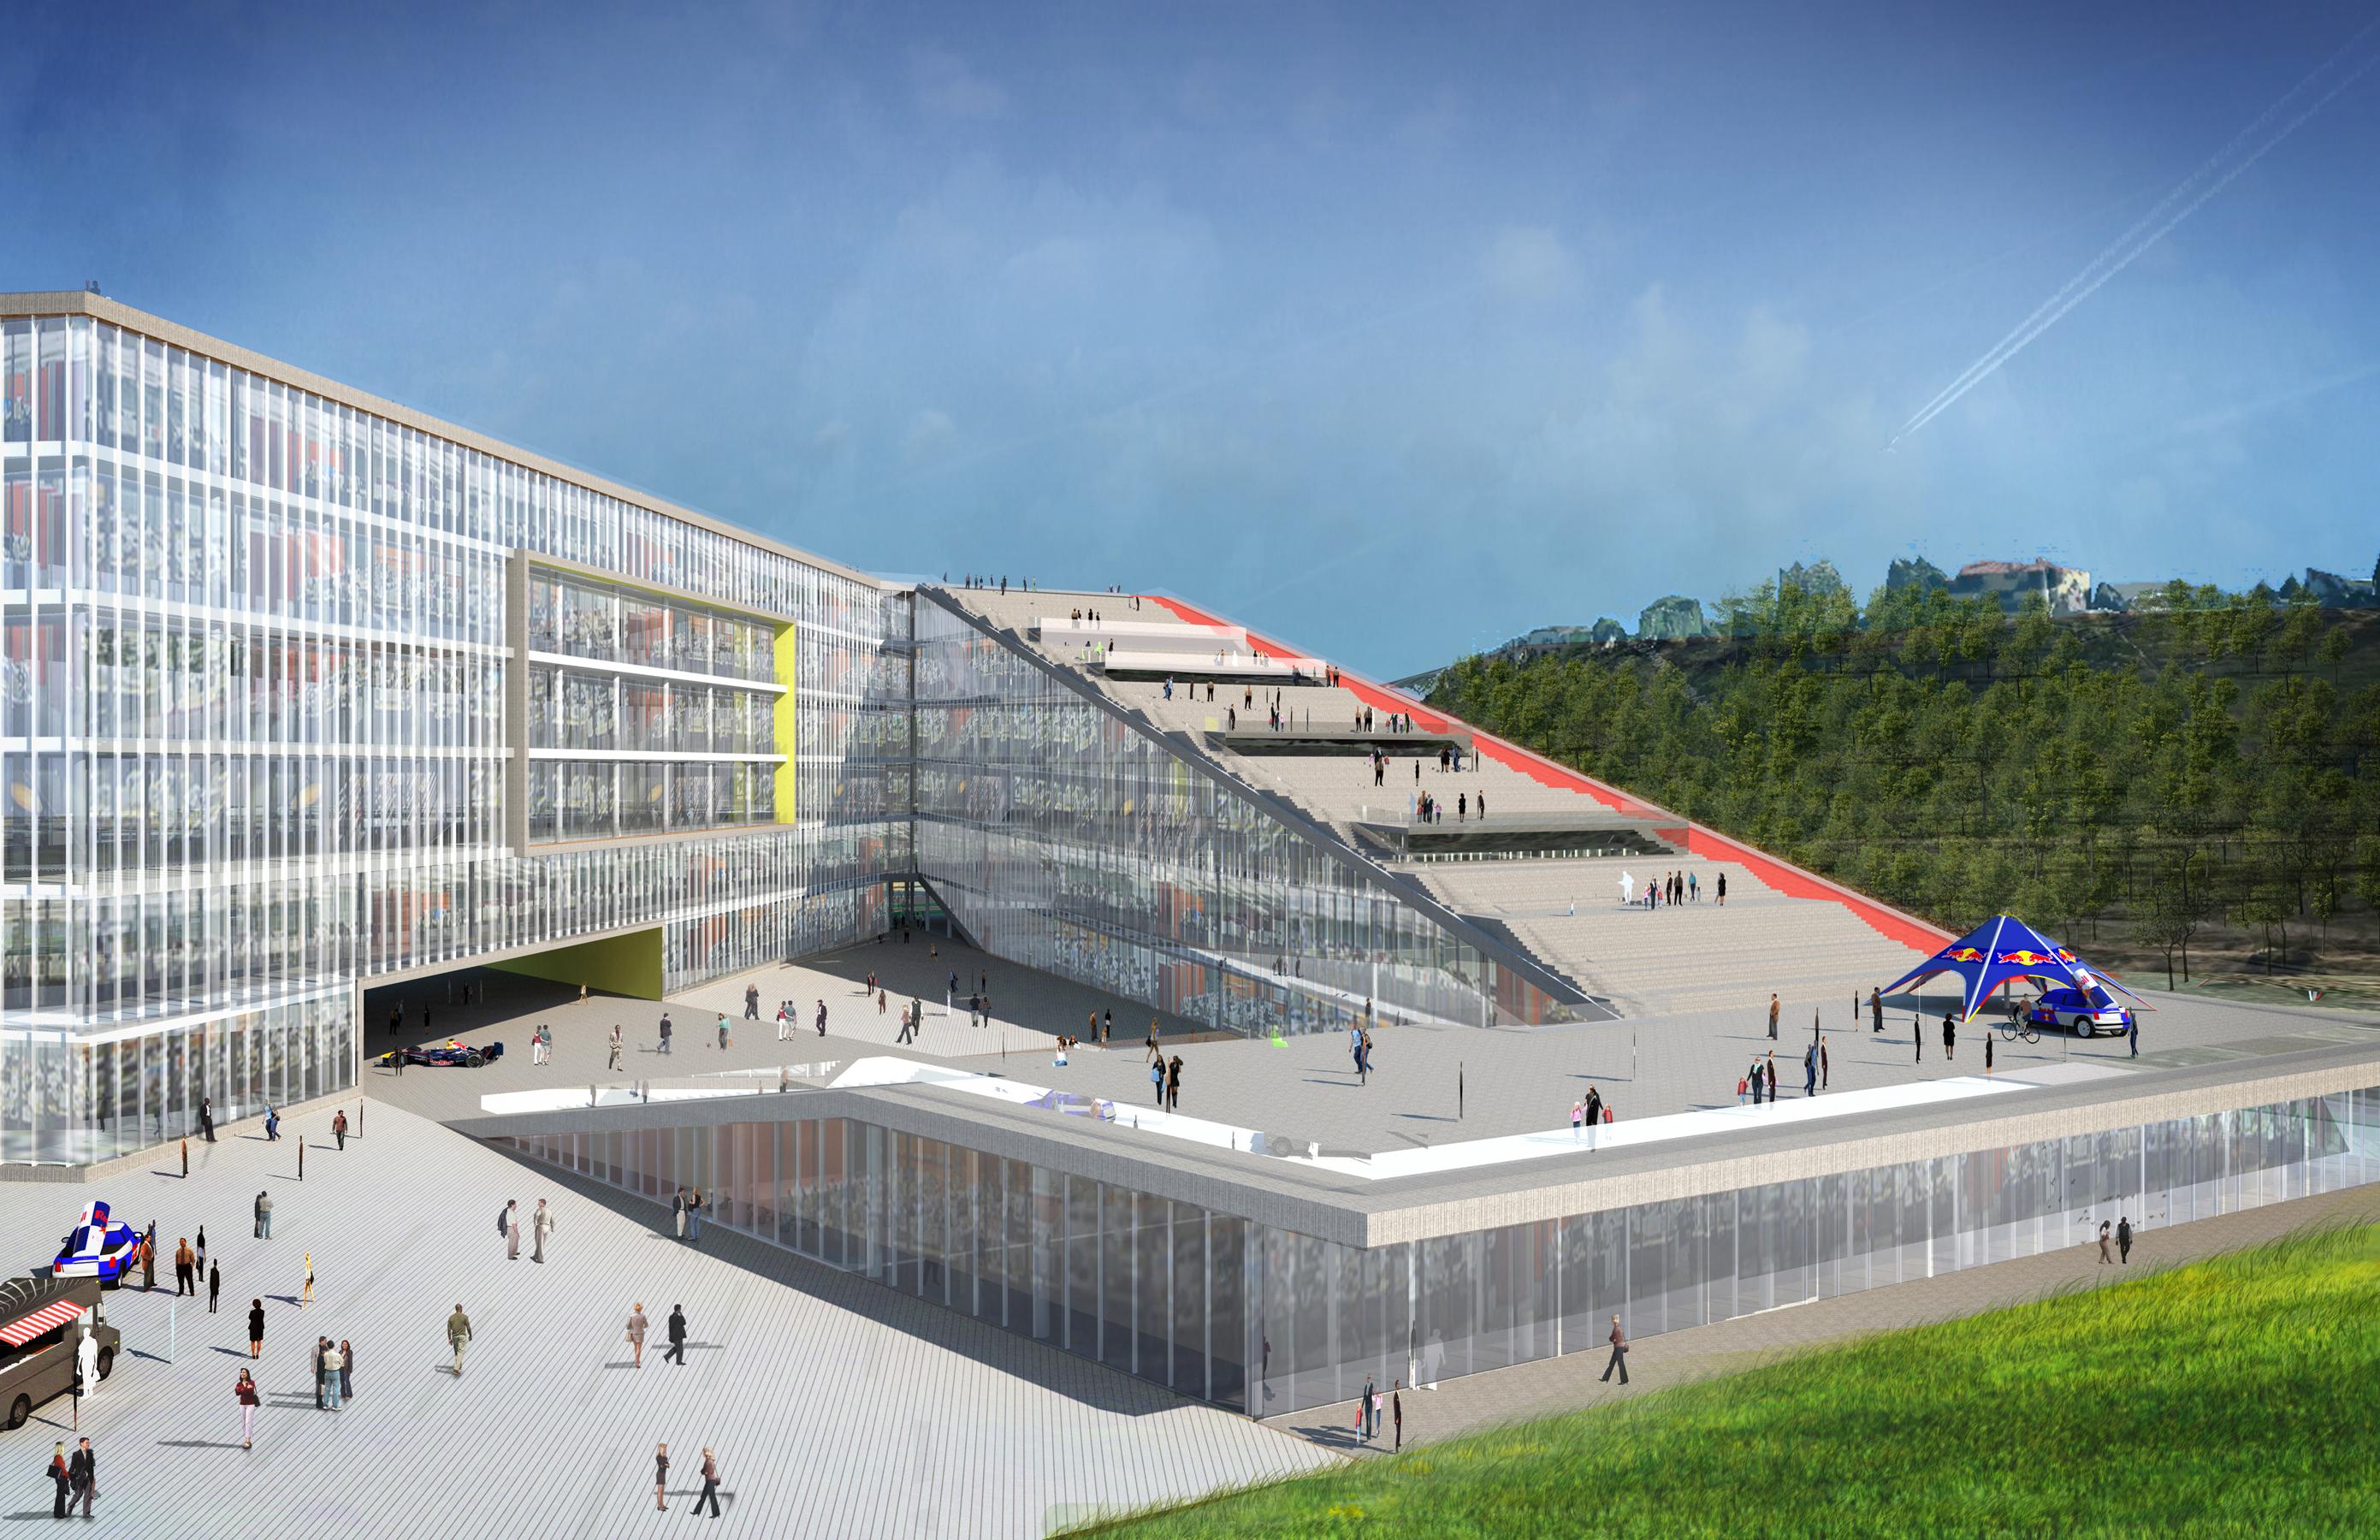 13 Red Bull Headquarters North America open studio architecture OSA - Option 2 exterior rendering